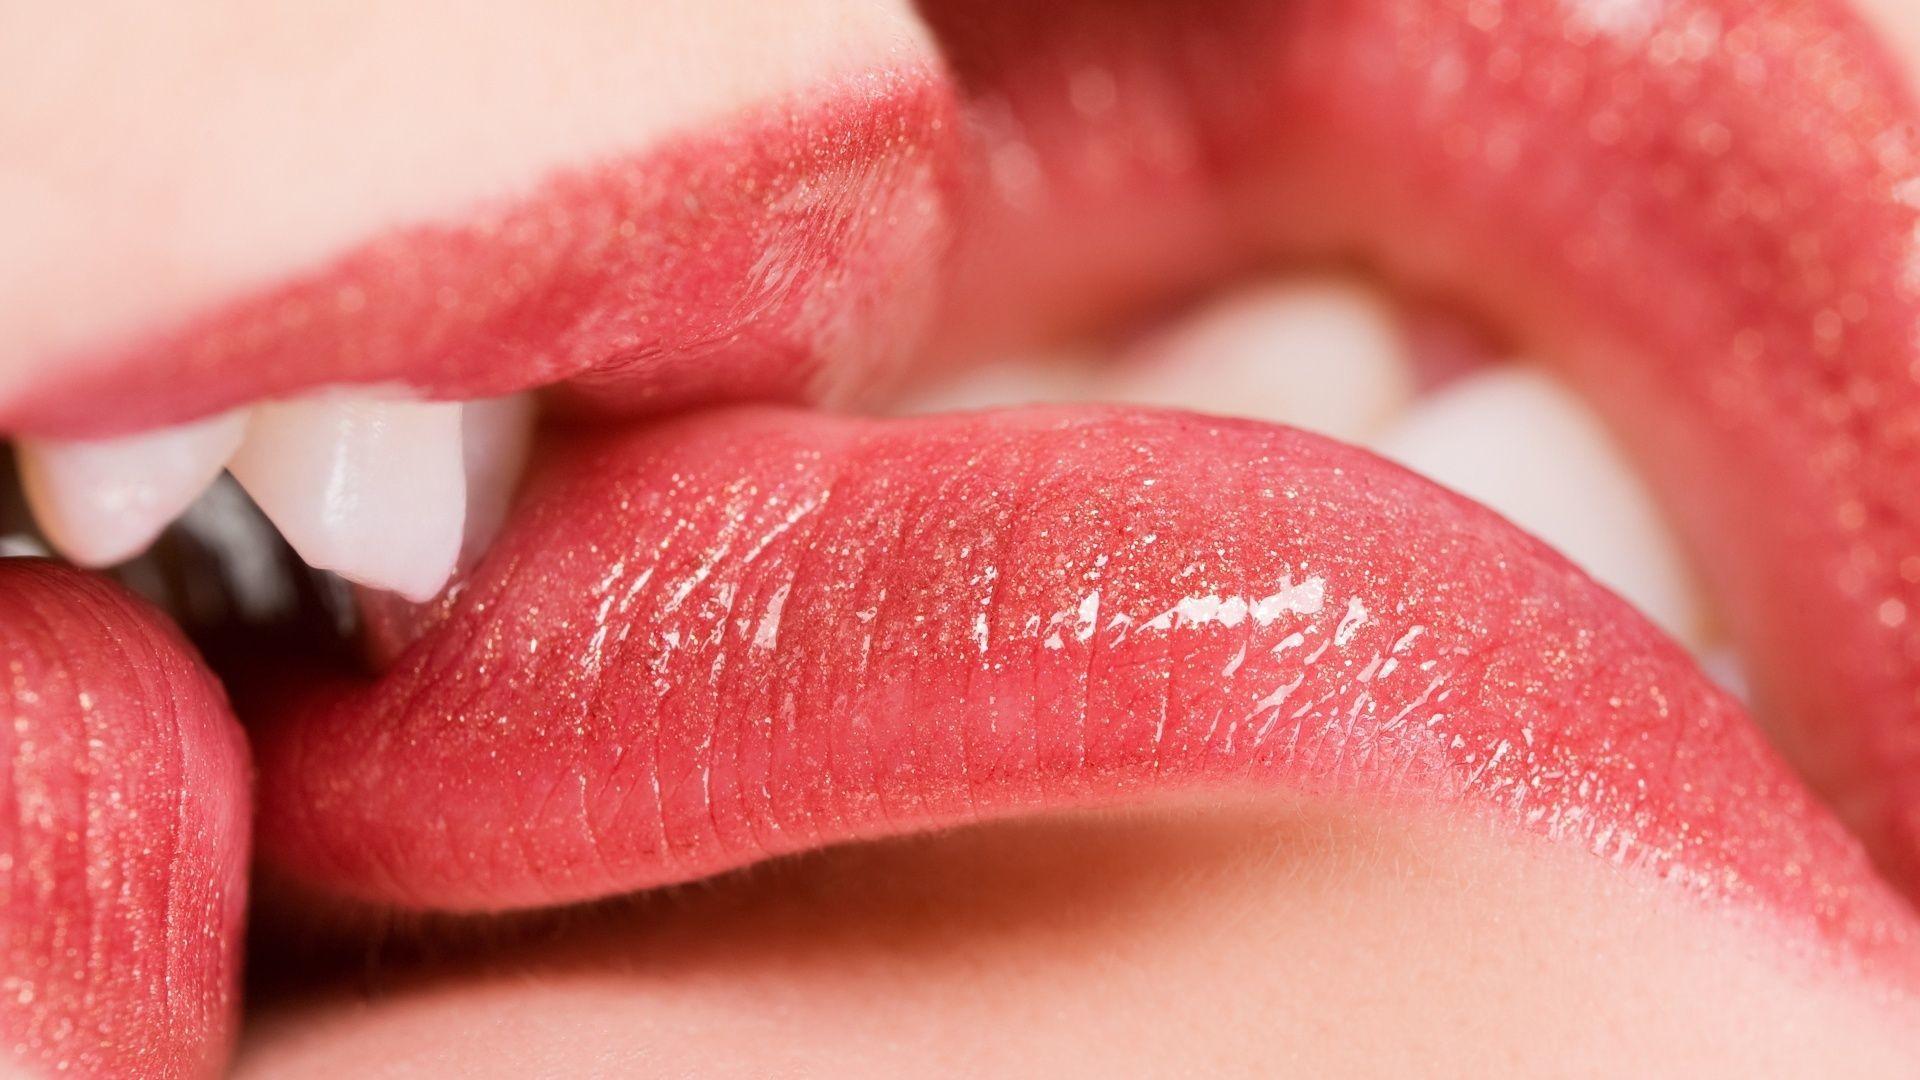 kiss-of-girl-two-girl-nude-art